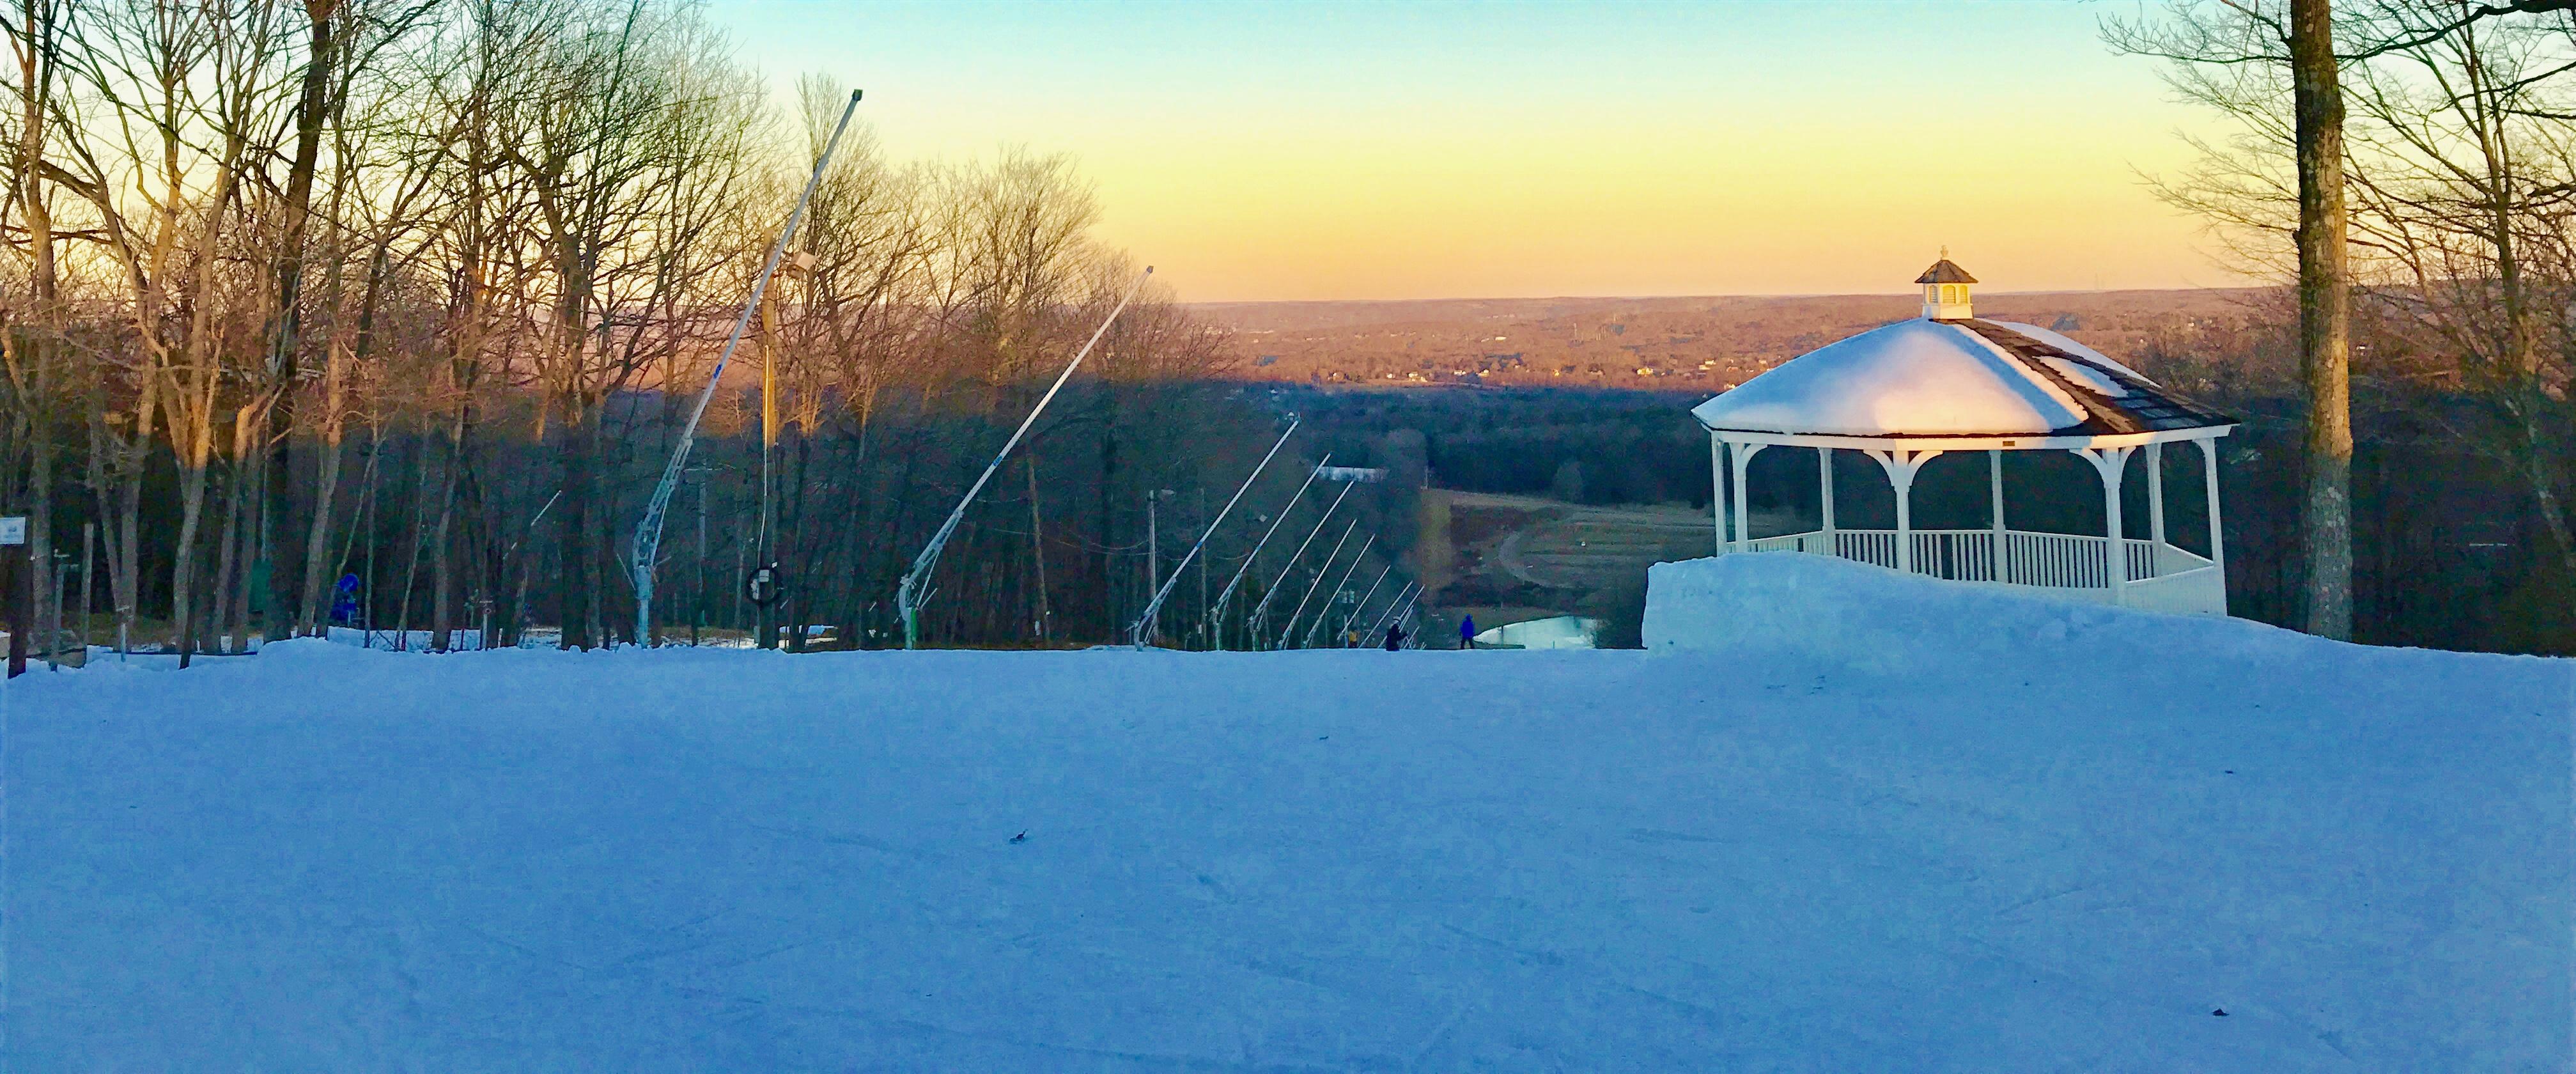 powder ridge ski area - wikipedia